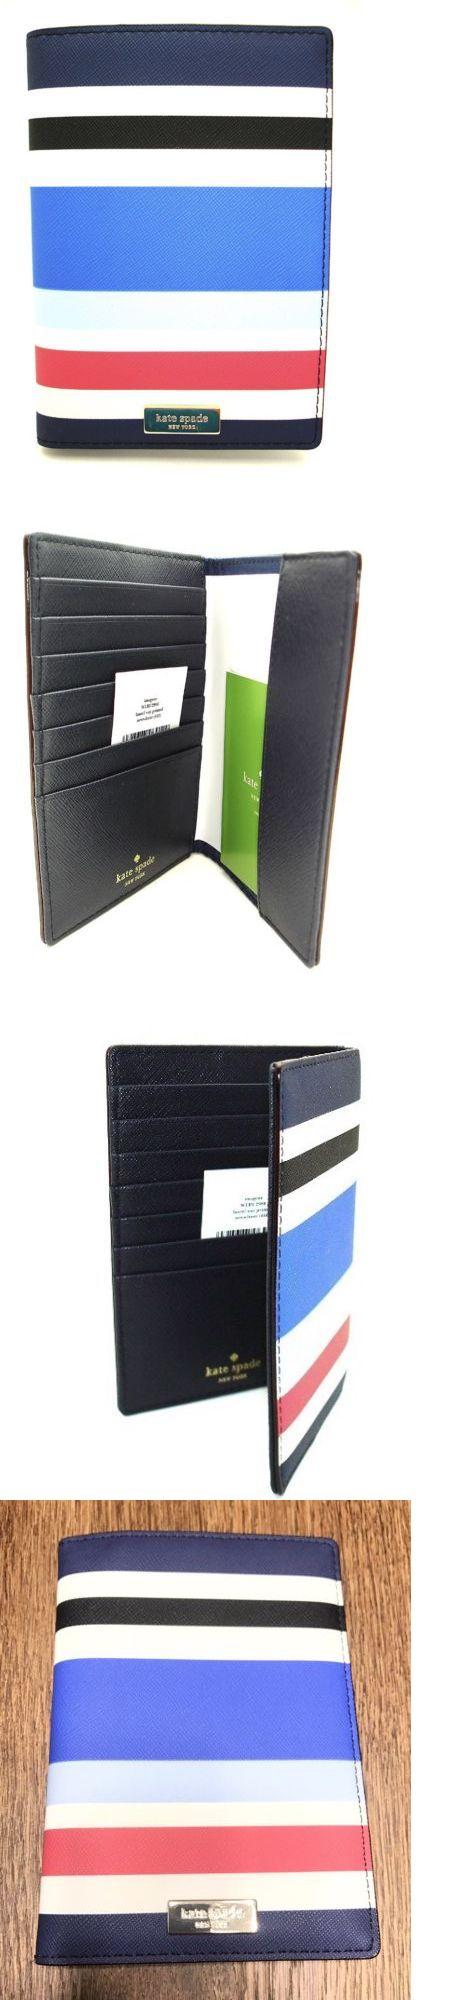 Passport Holders 169288: Nwt Kate Spade Imogene Wlru2980 Laurel Way Printed Passport Holder Wallet $89 -> BUY IT NOW ONLY: $48.99 on eBay!